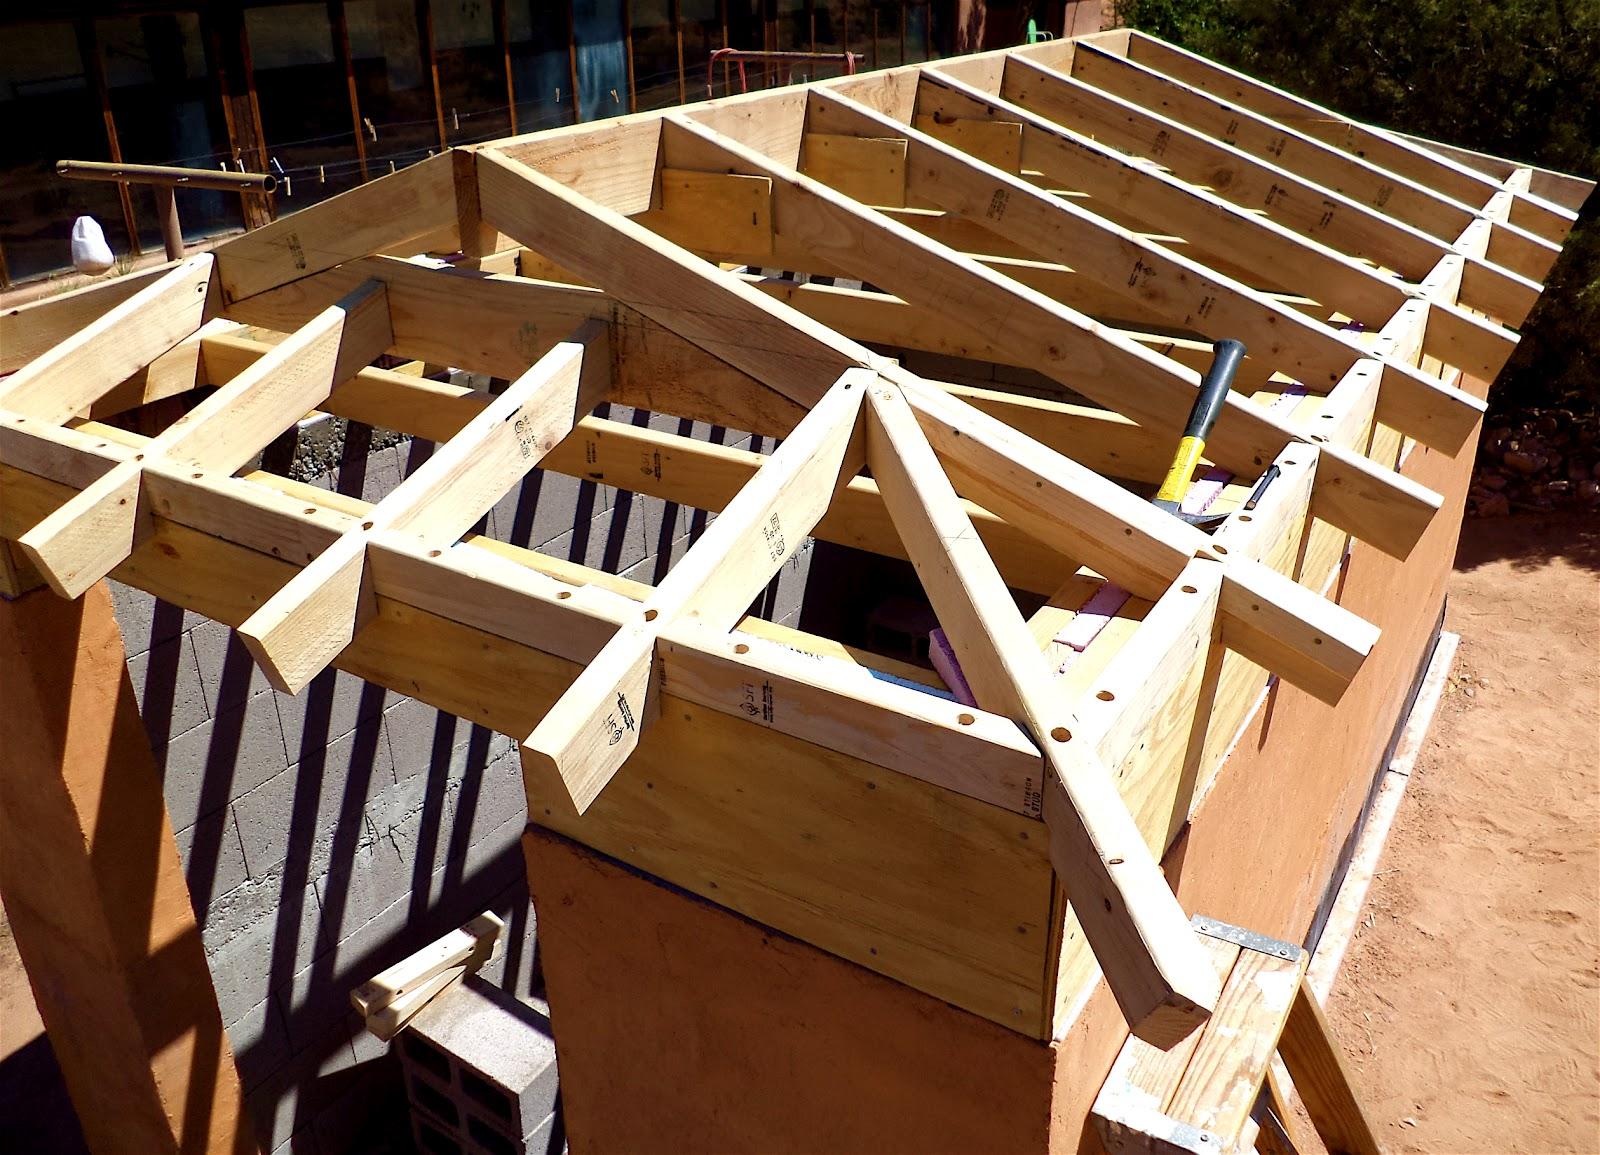 Alt build blog building a well house 4 framing the hip for Build blog